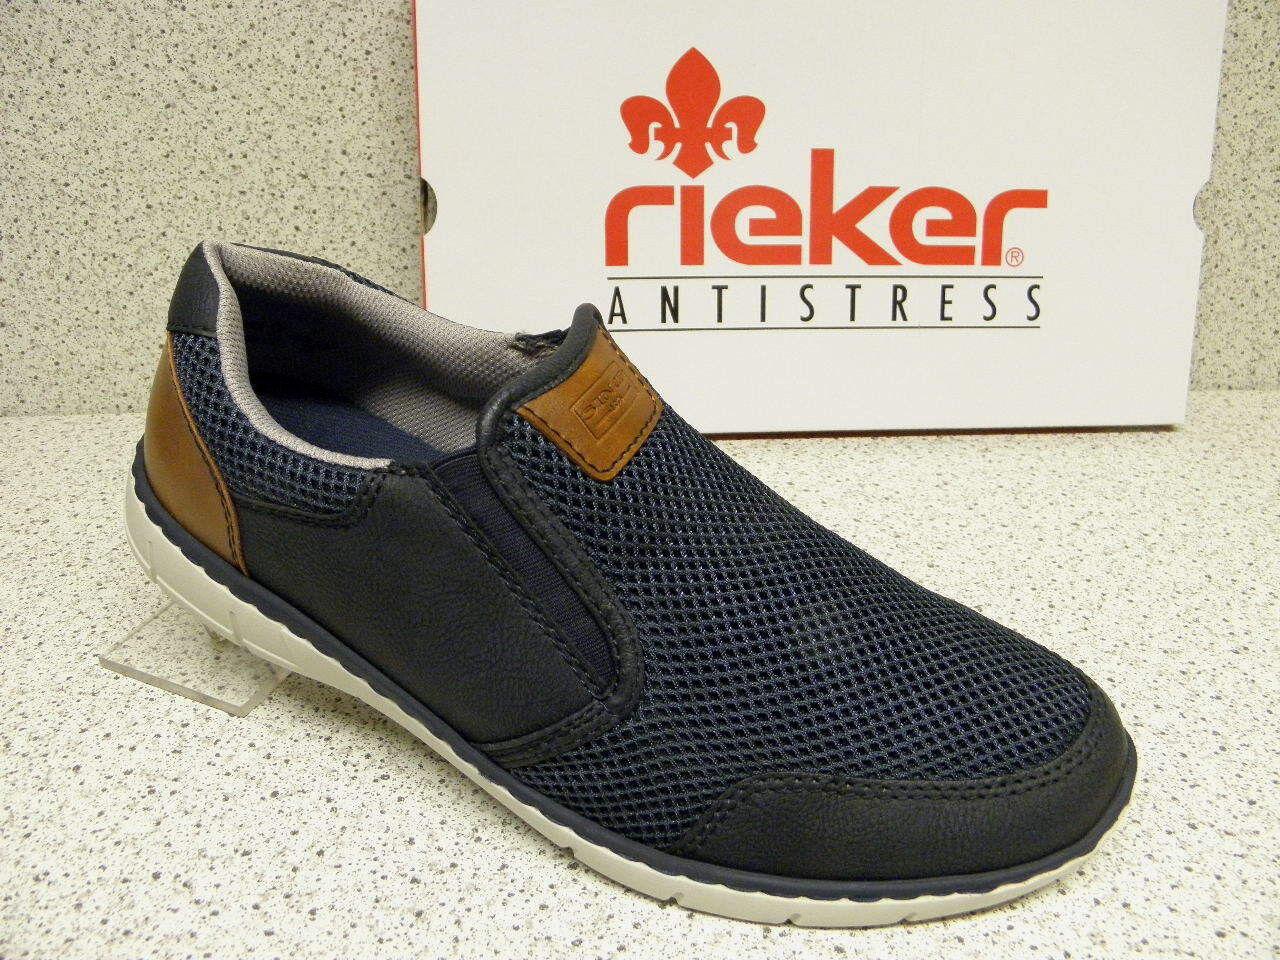 Rieker ® riduce, alla moda, blu, + GRATIS Premium-Calze + 15850-15 (r357)